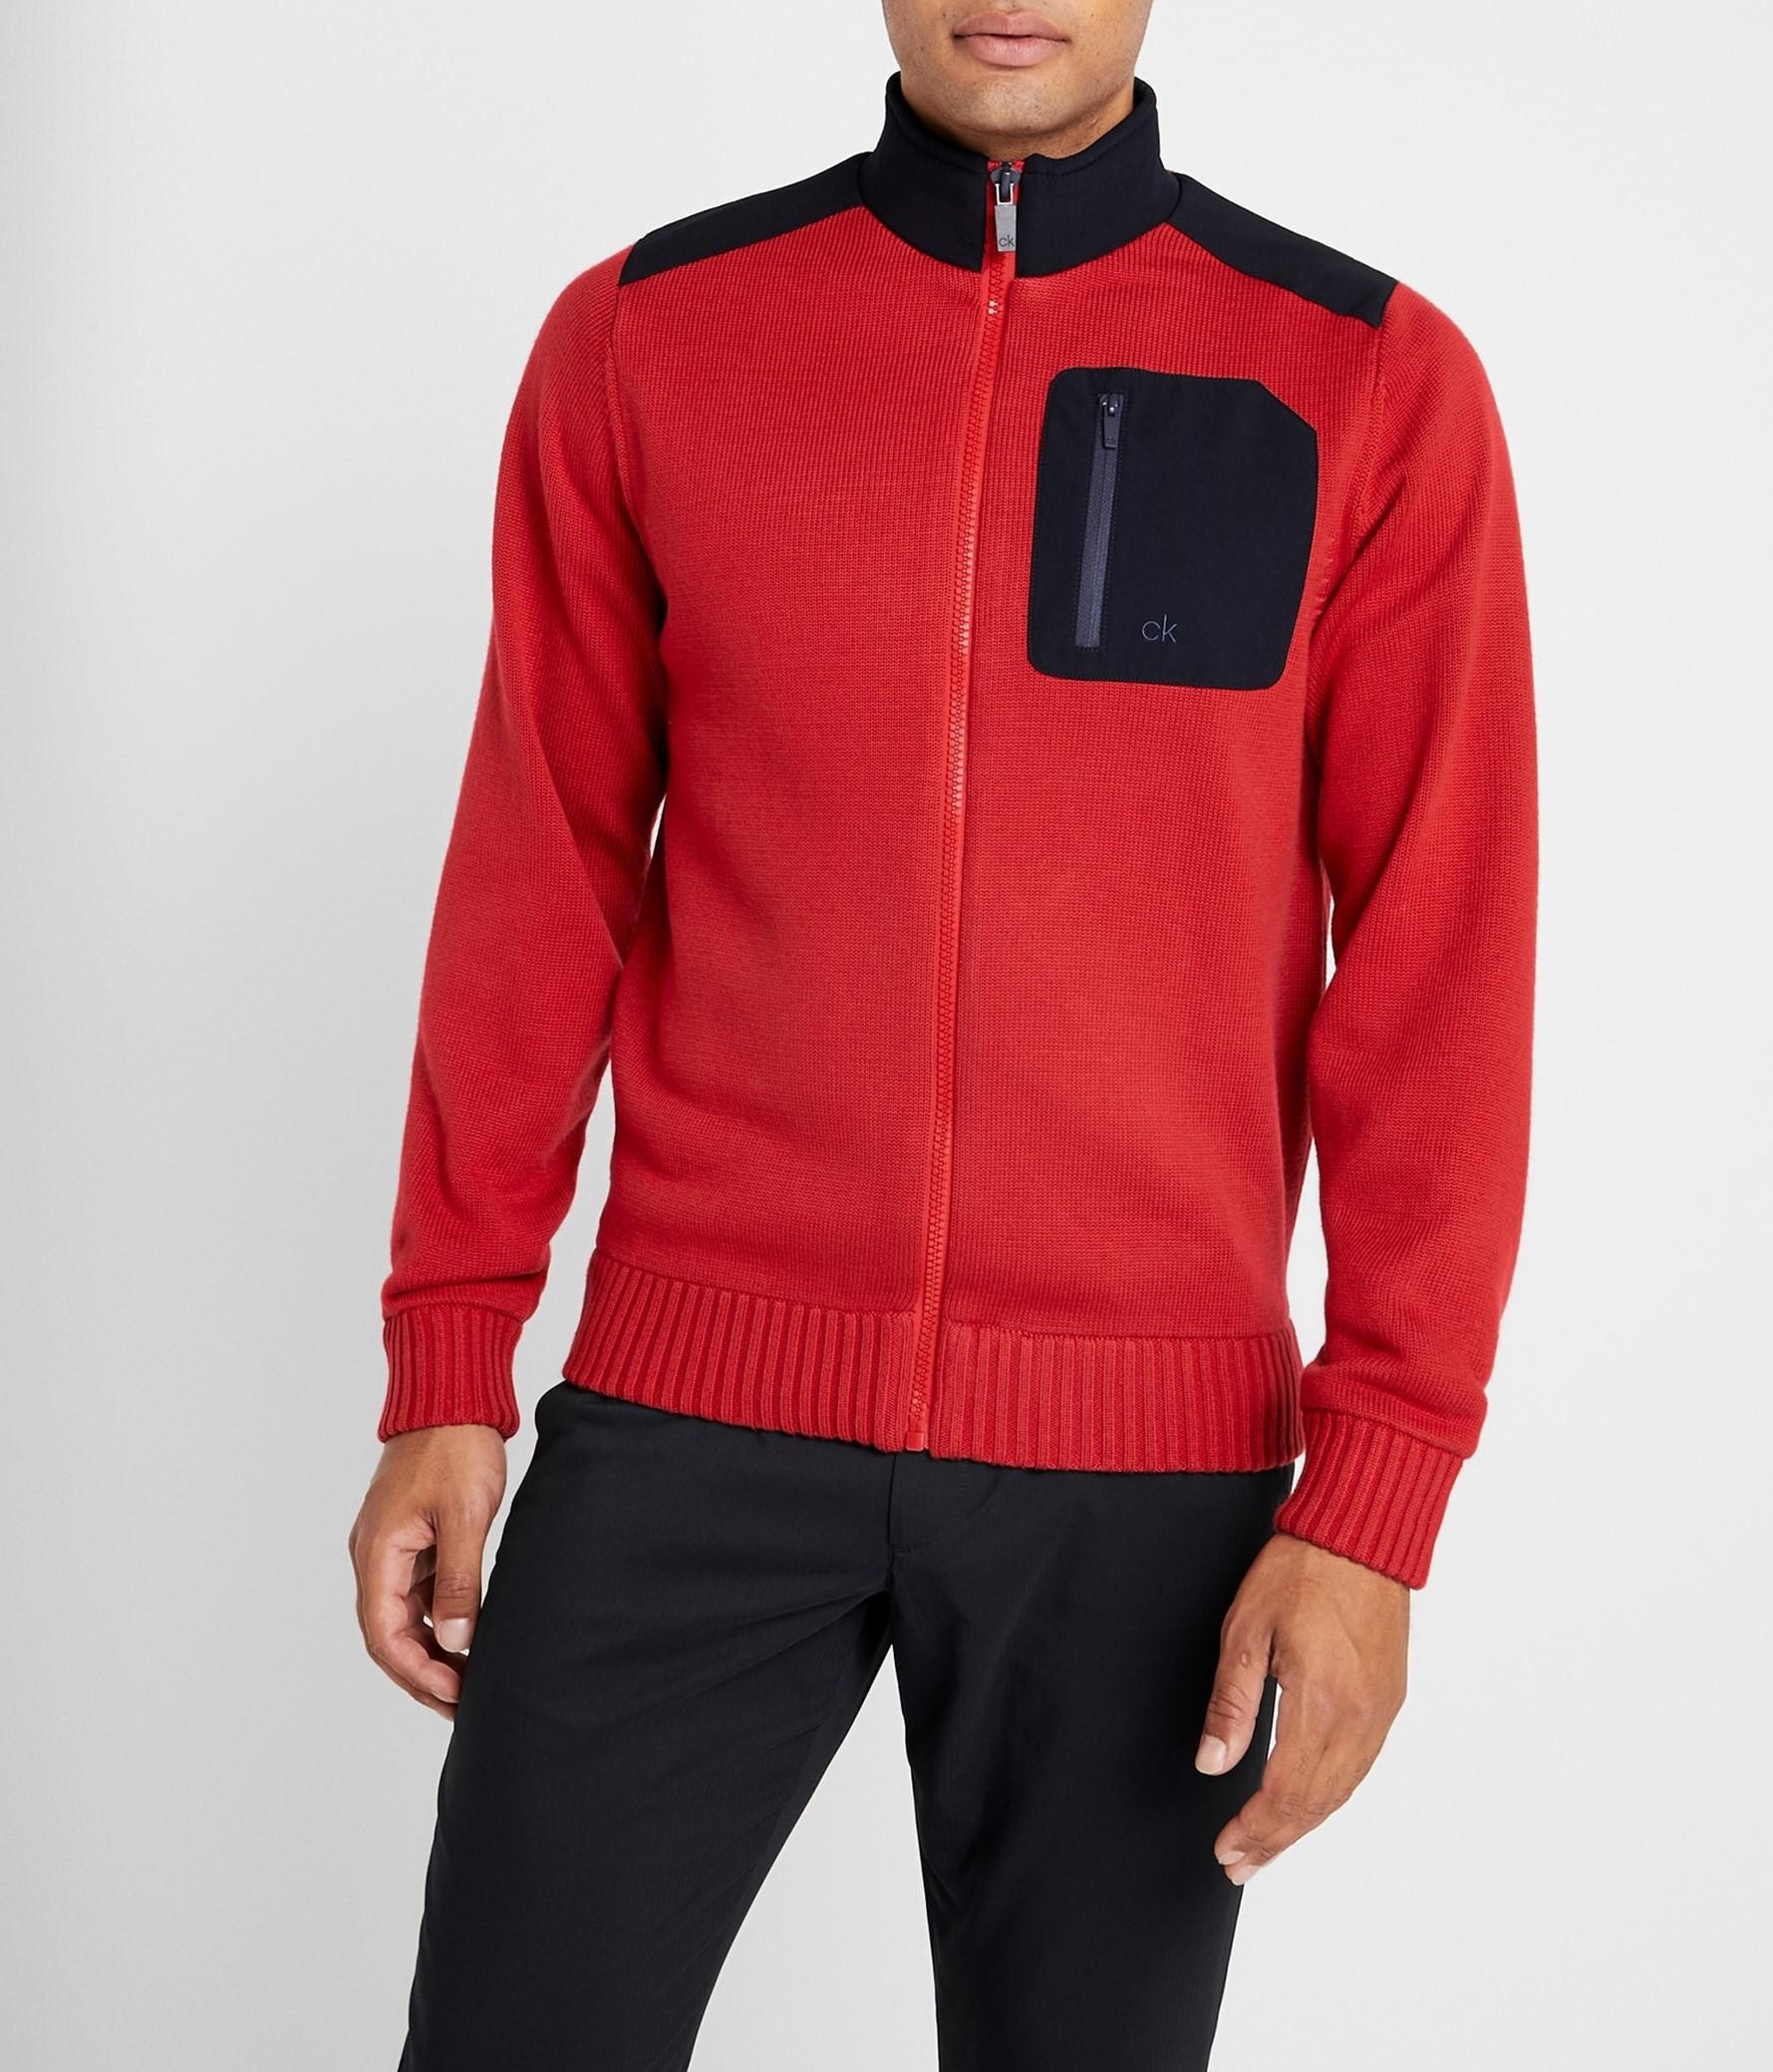 Calvin Klein Hr. Golf Strickjacke Lined Sweater CKMA19308 rot